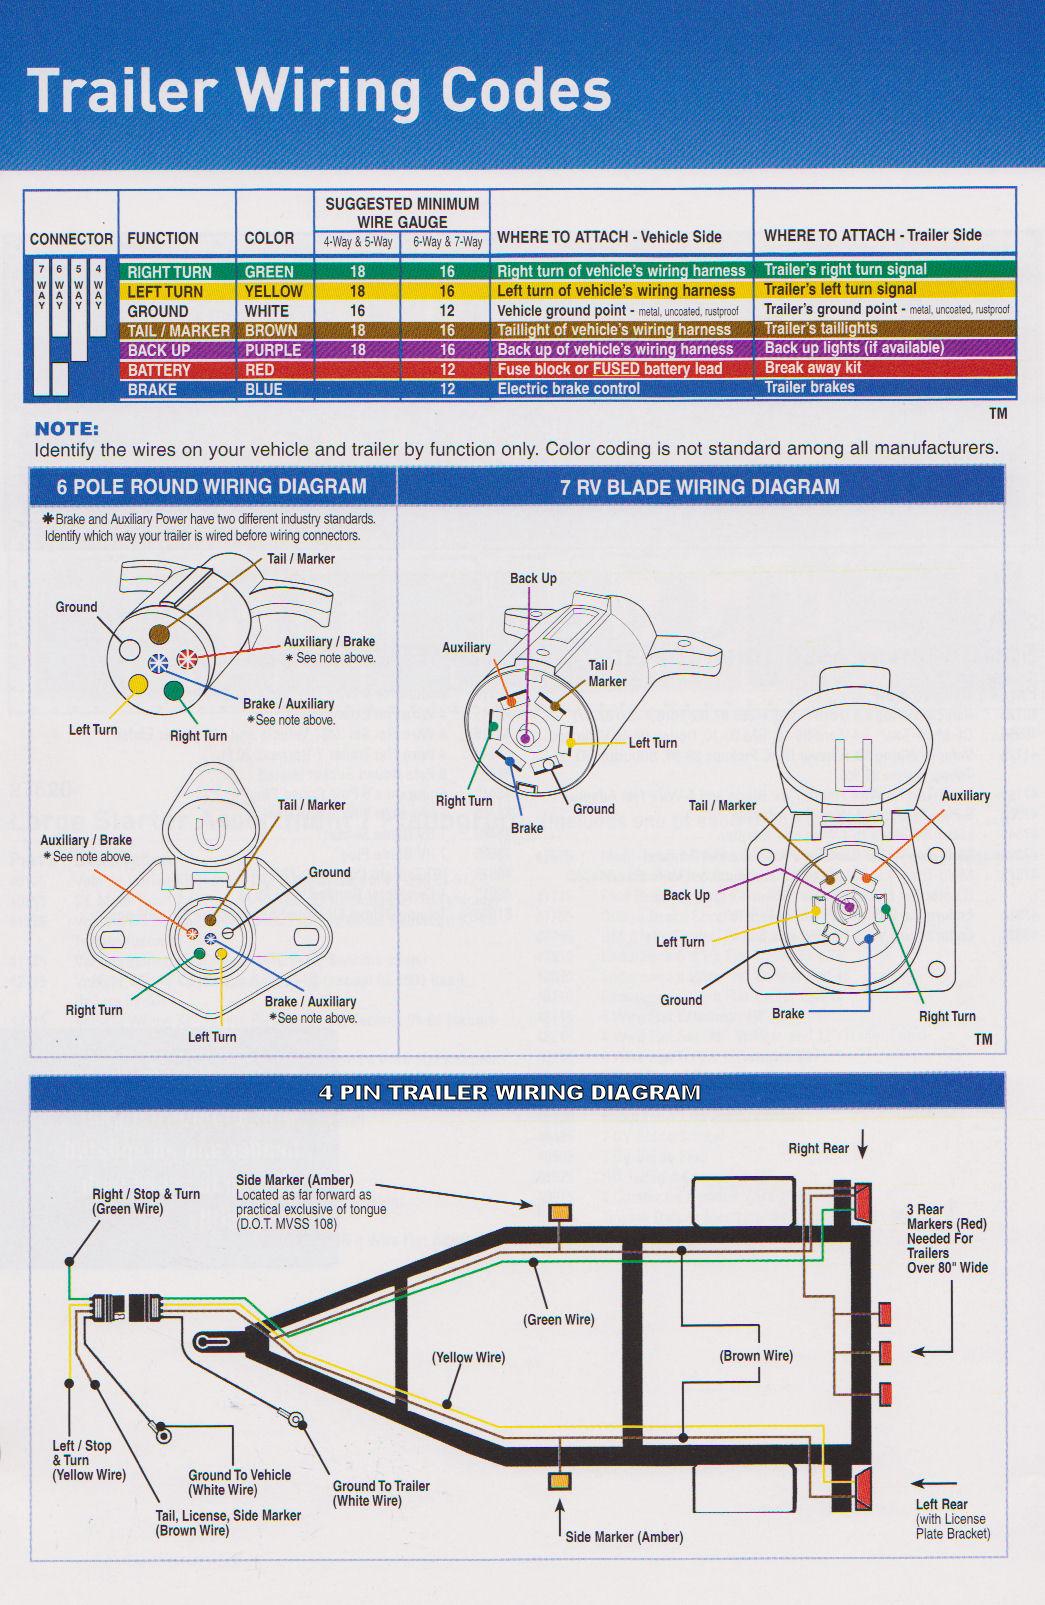 4 Way Trailer Wiring Diagram 2007 Trail